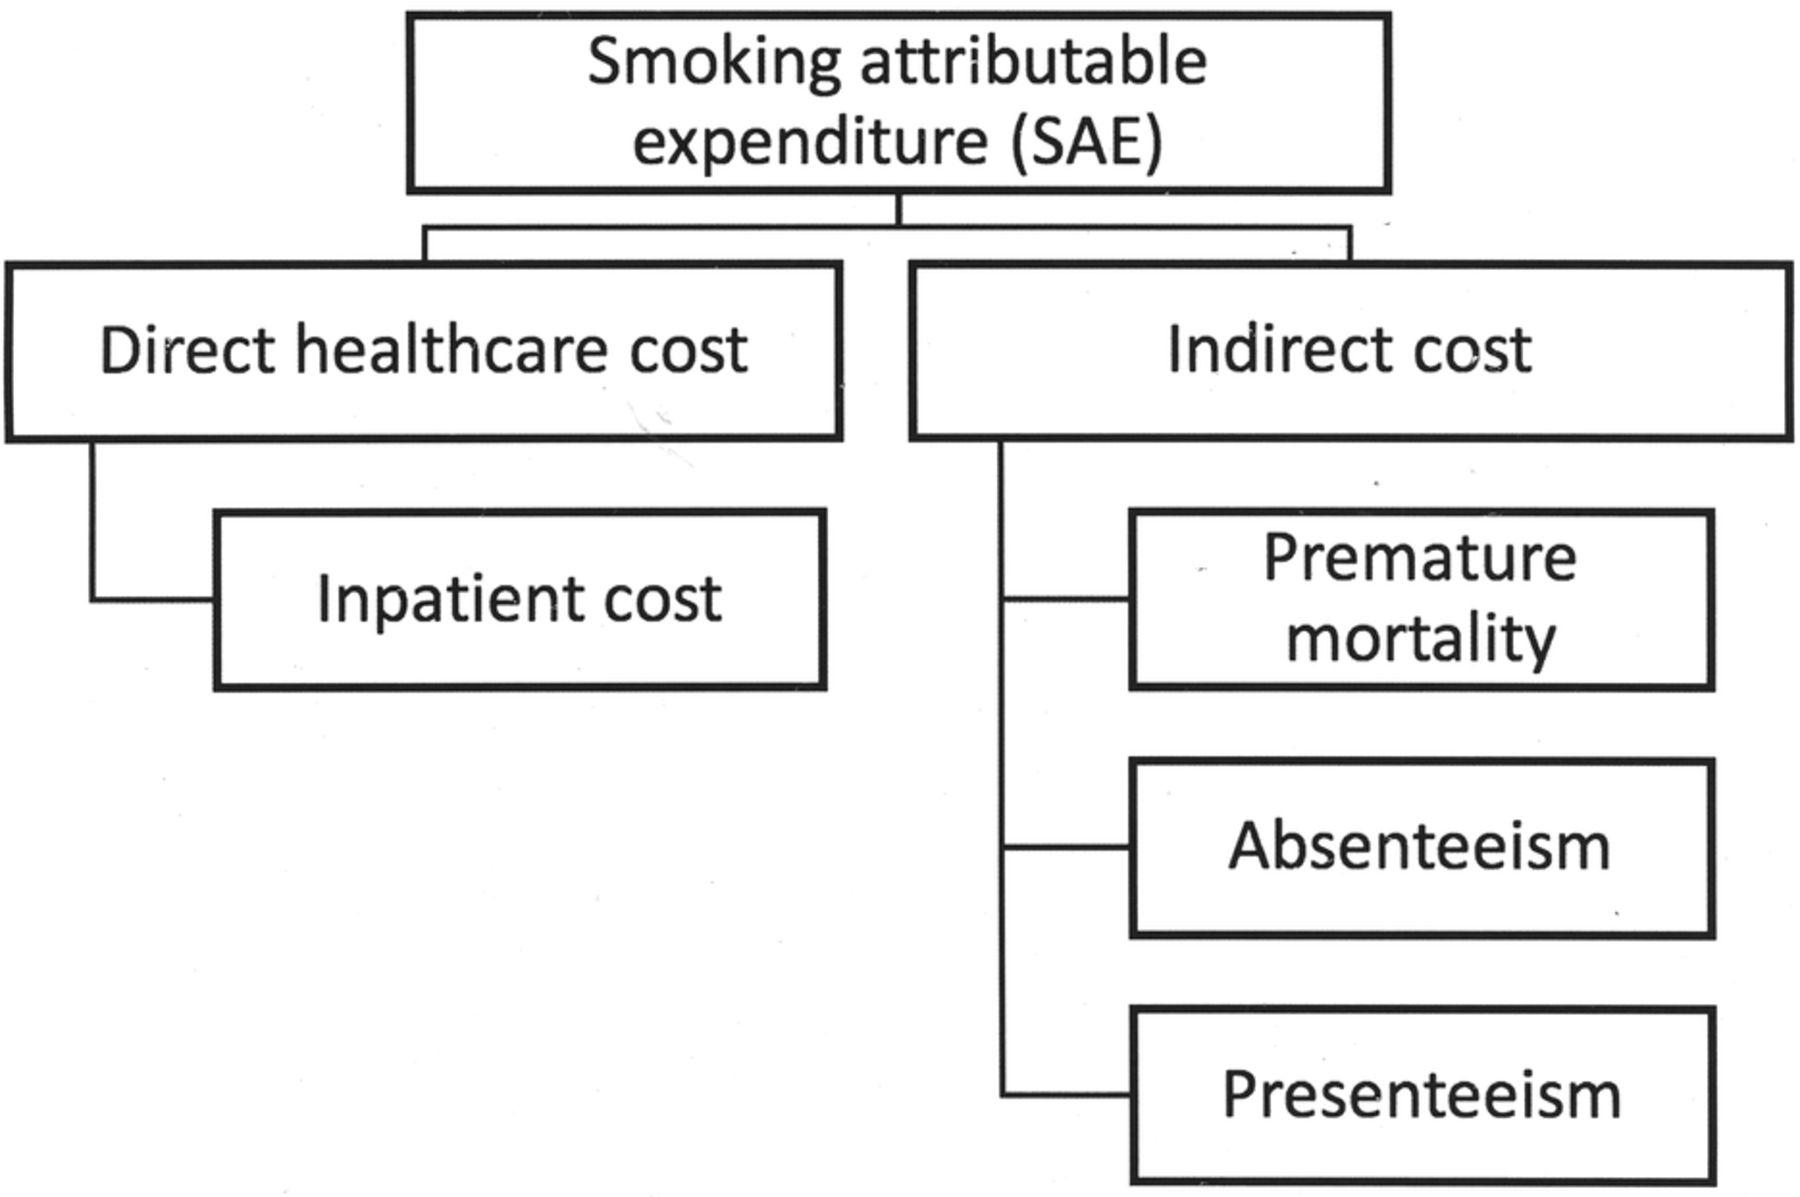 Prevalence-based, disease-specific estimate of the social